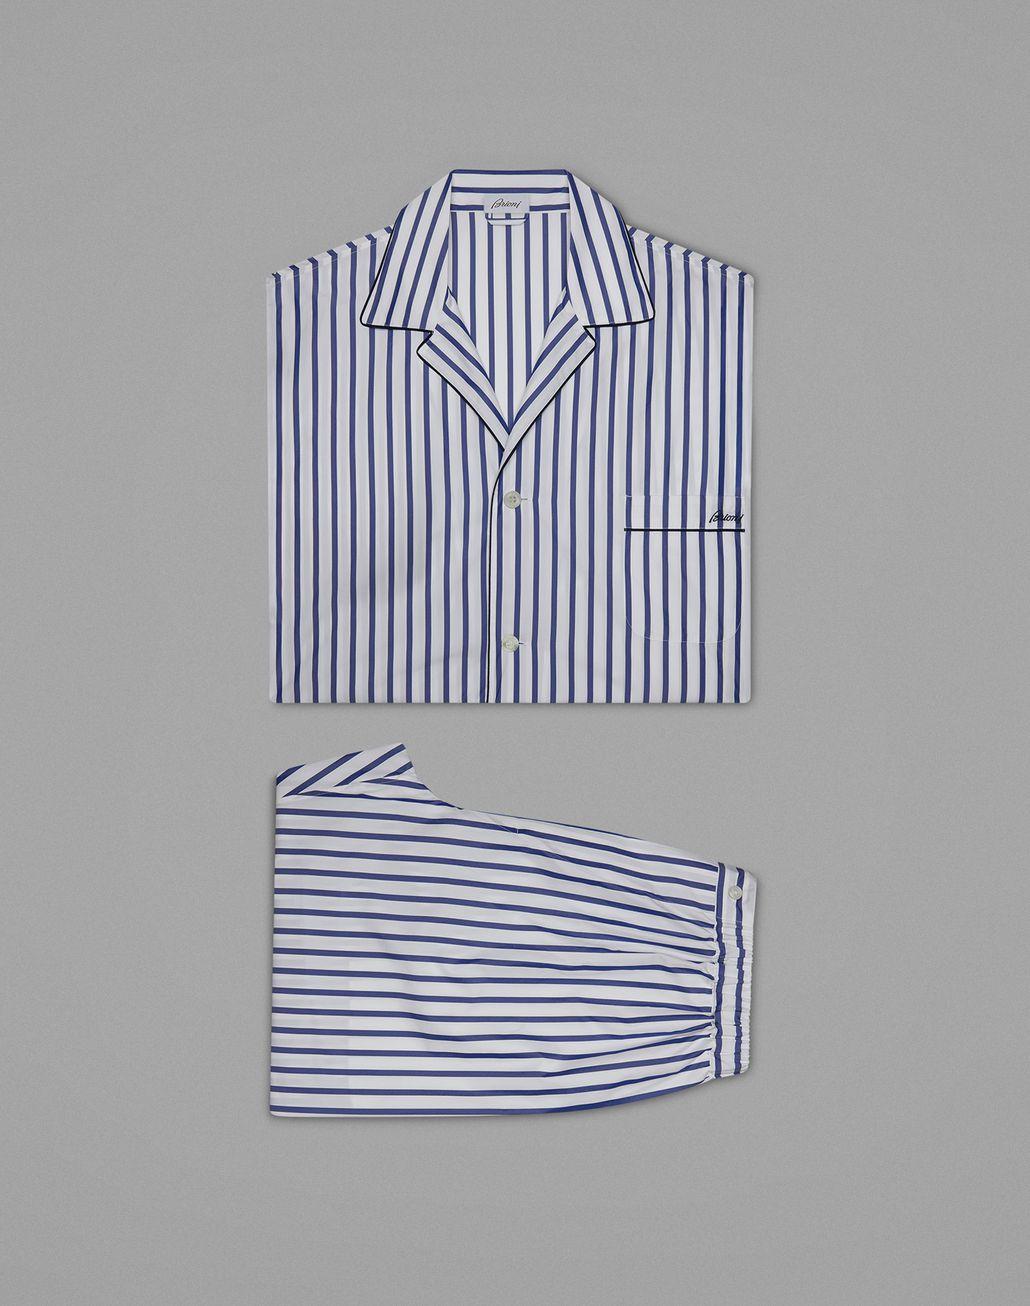 BRIONI Синяя Пижама В Полоску Одежда для дома Для Мужчин f